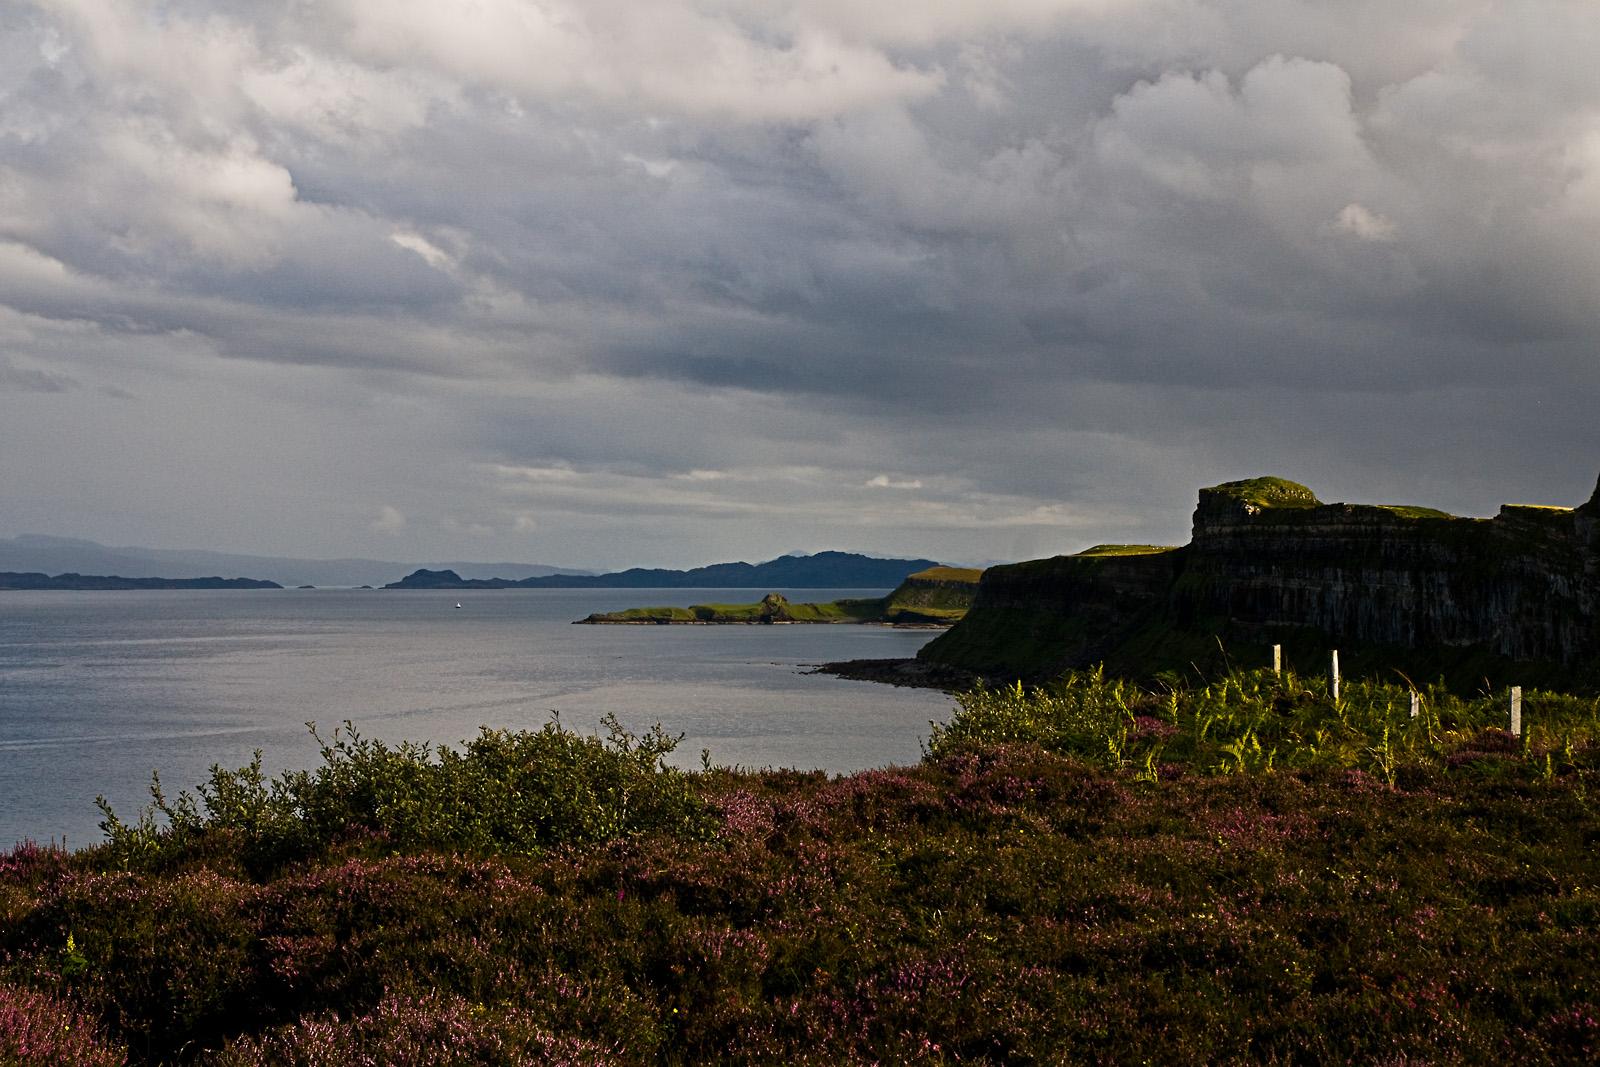 Schottland LXXIX - Skye